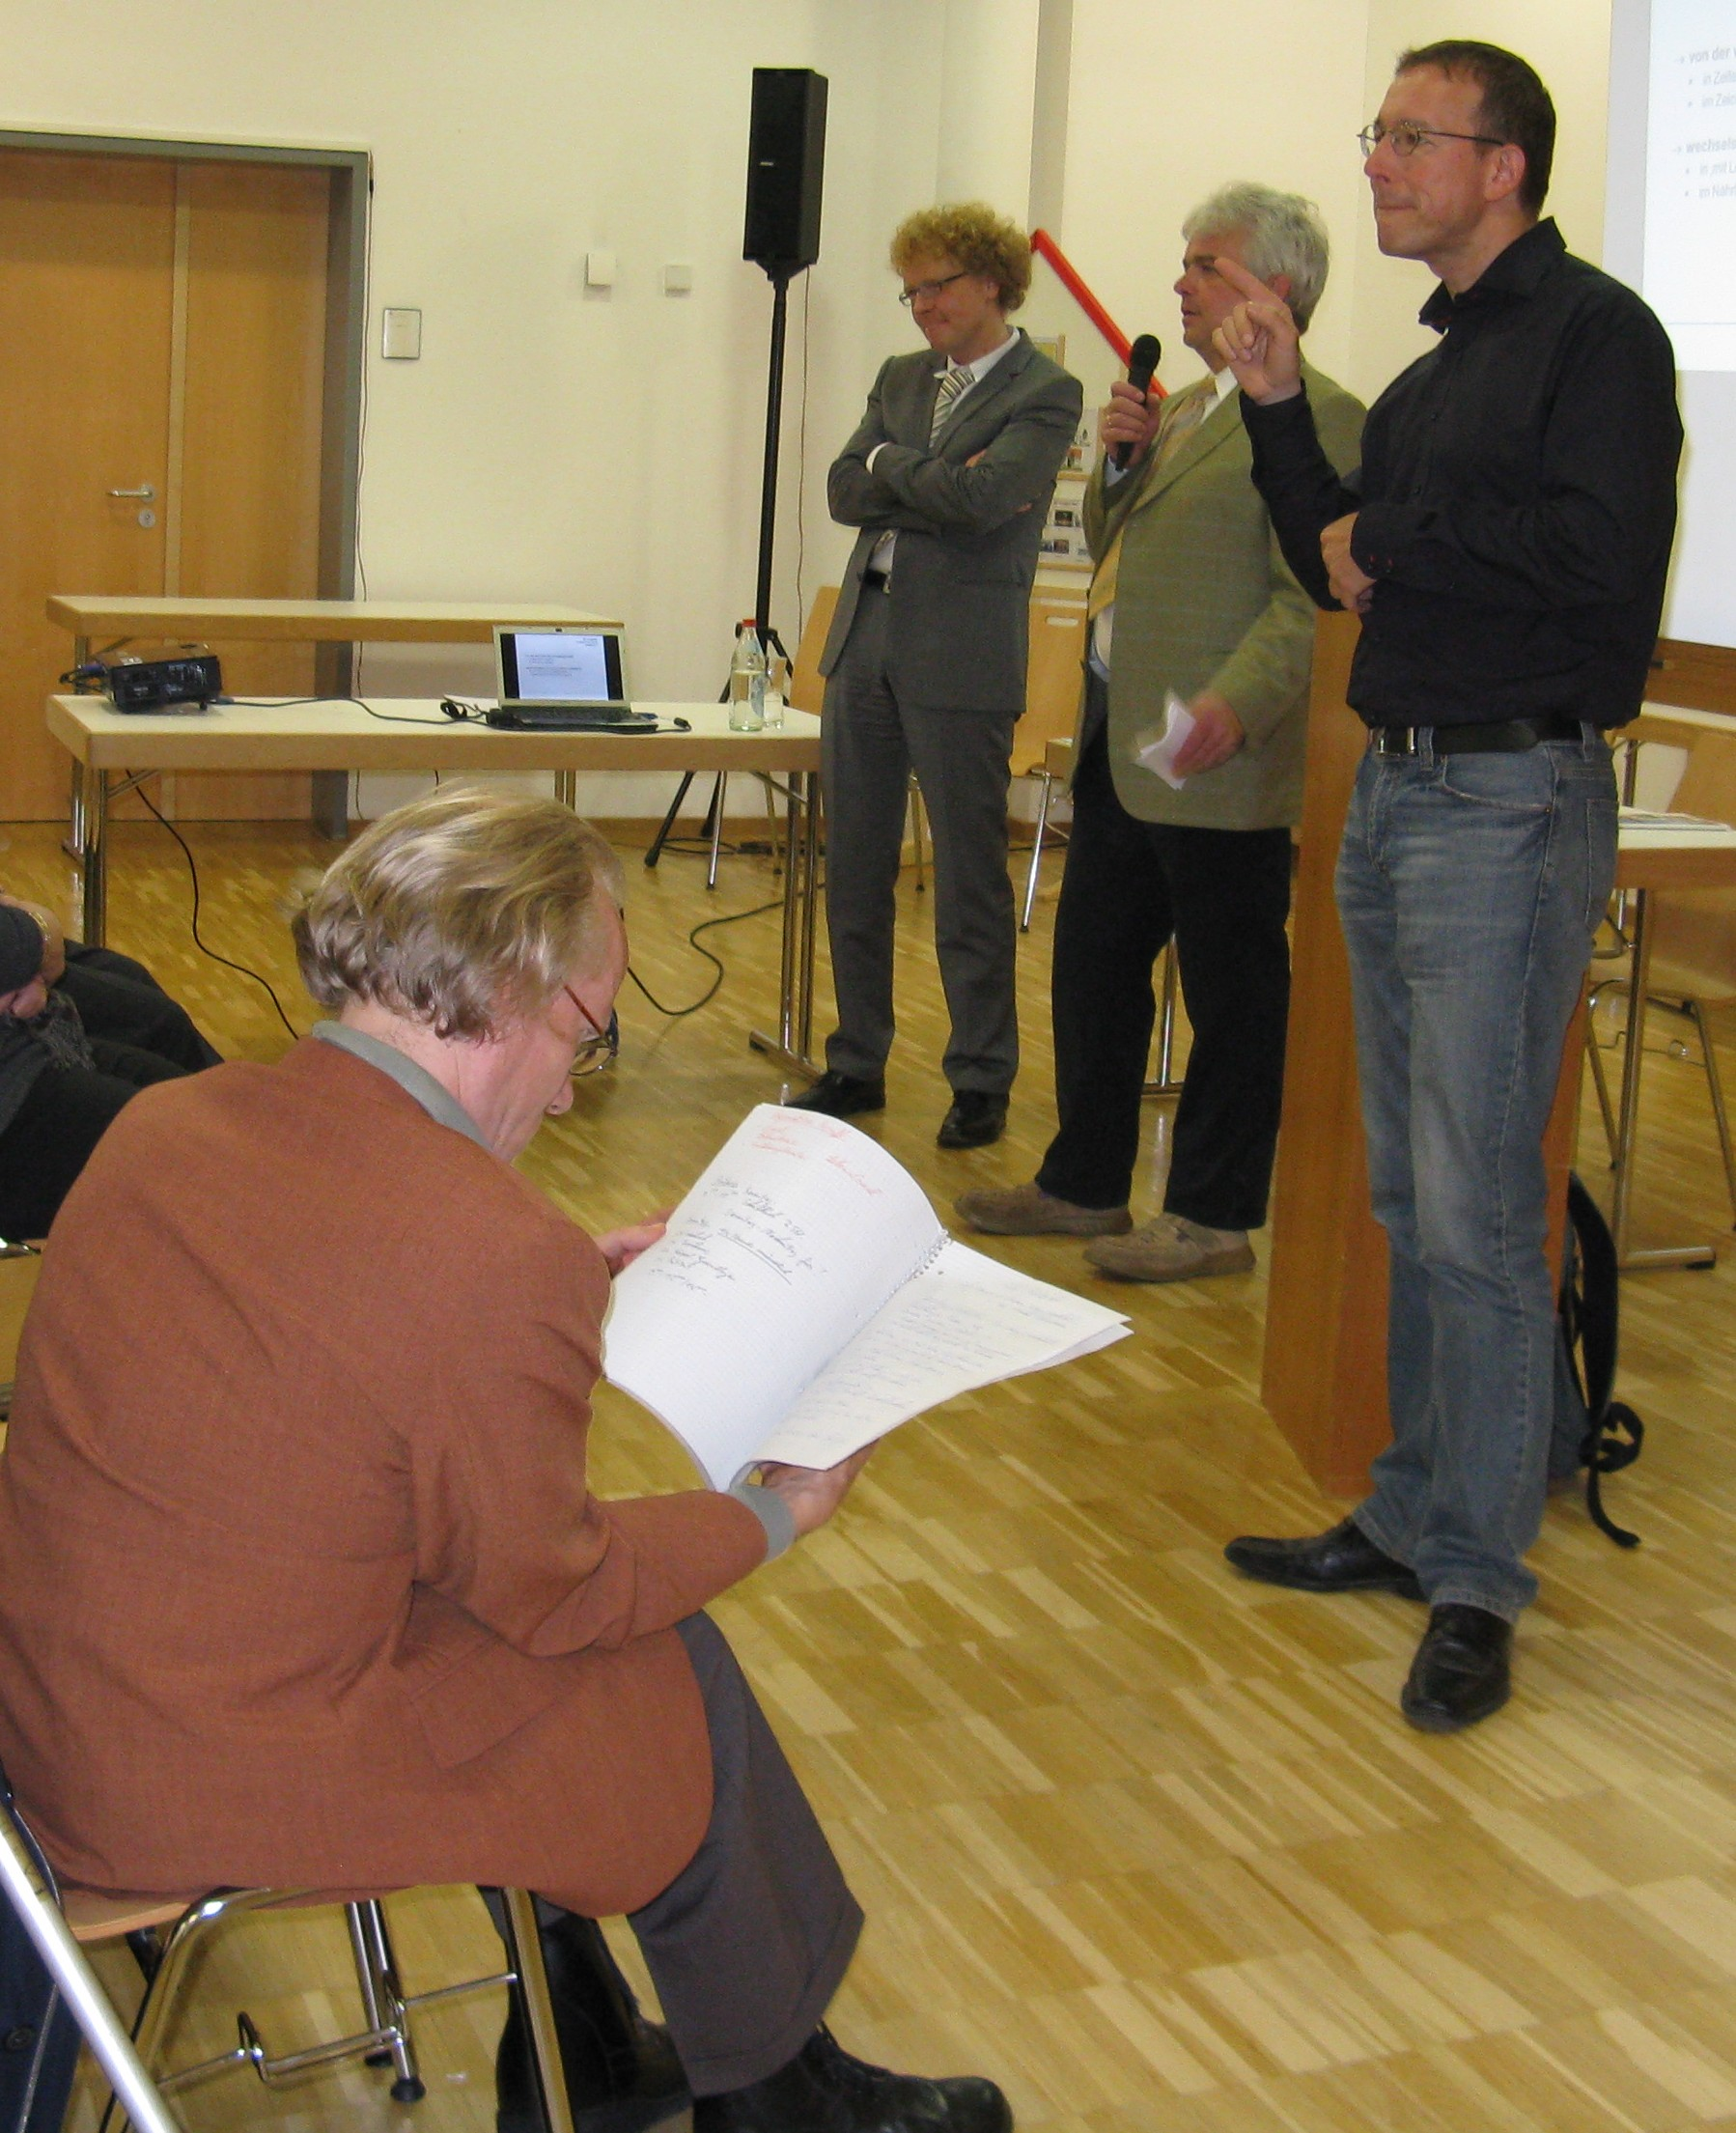 Prof. Dr. Lob-Hüdepohl, Diakon Thomas Schmidt, Pastoralreferent  Michael Geisberger (Gebärdendolmetscher) und Pastoralreferent Thomas Göppel (sitzend)